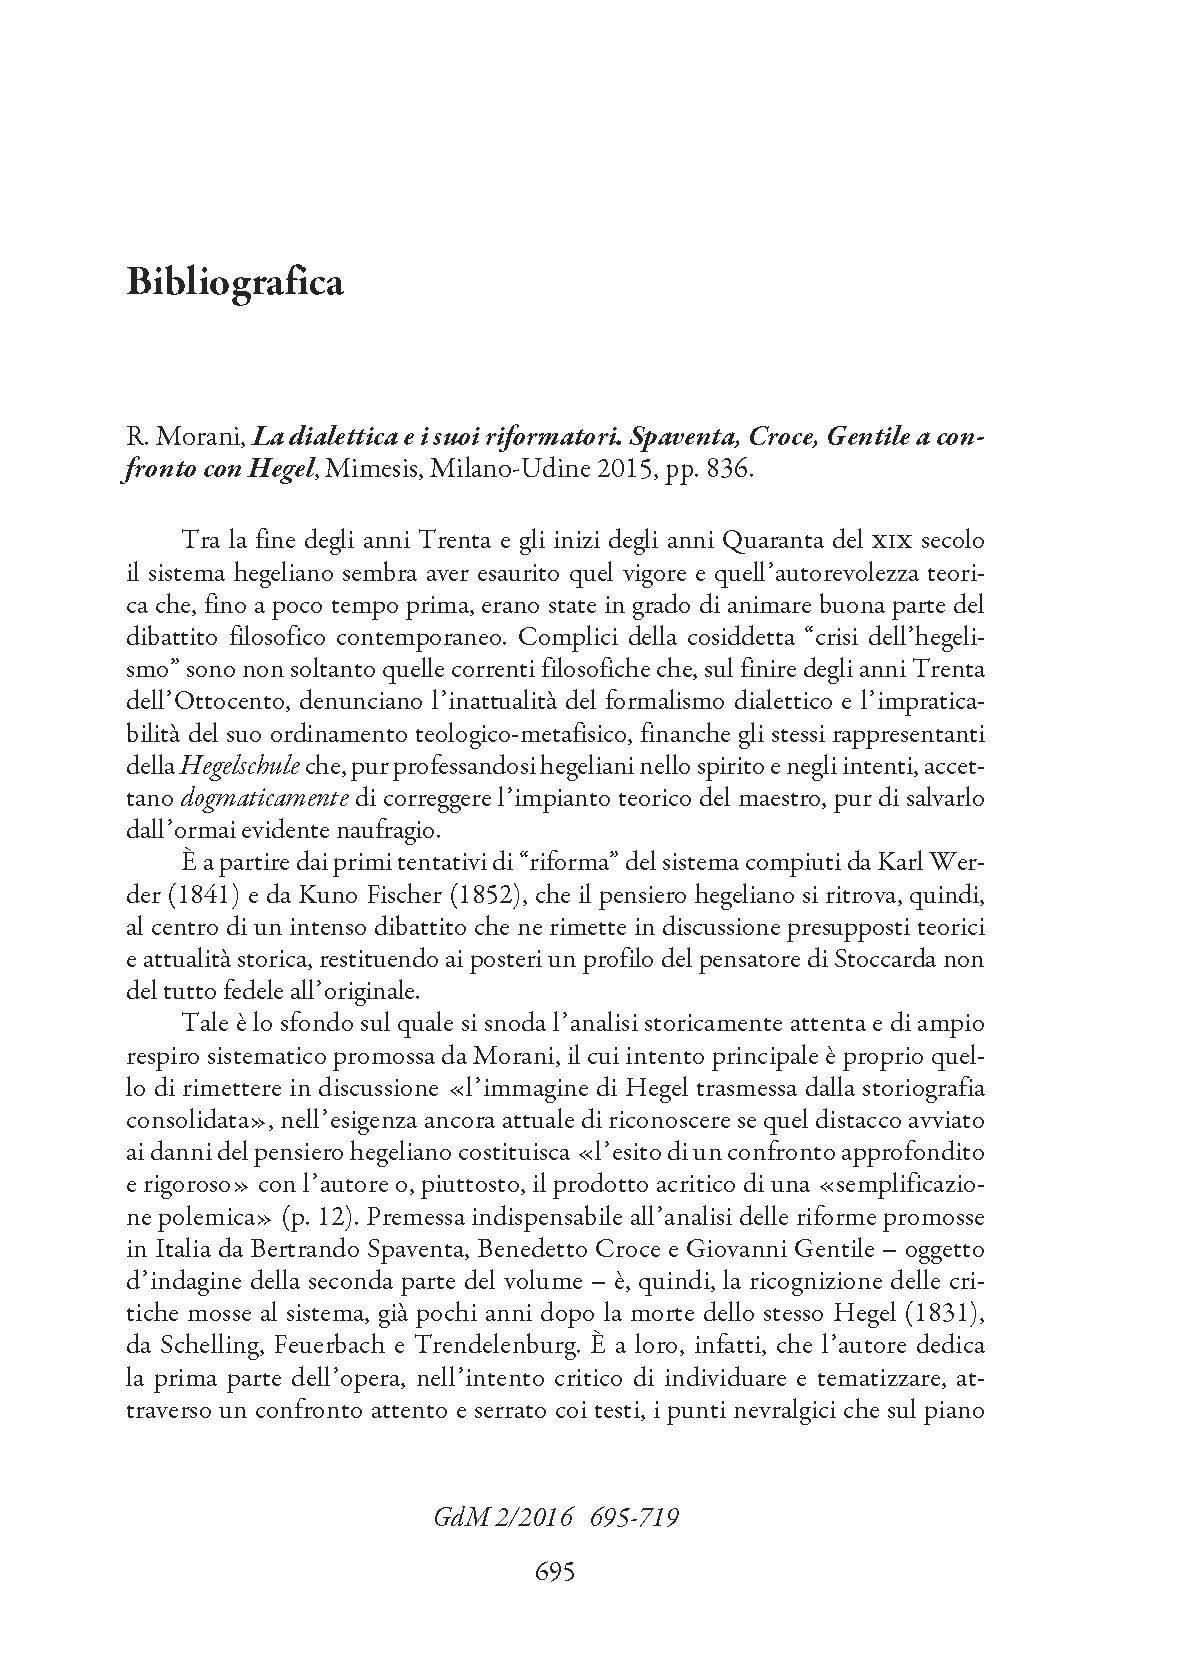 Bibliografica